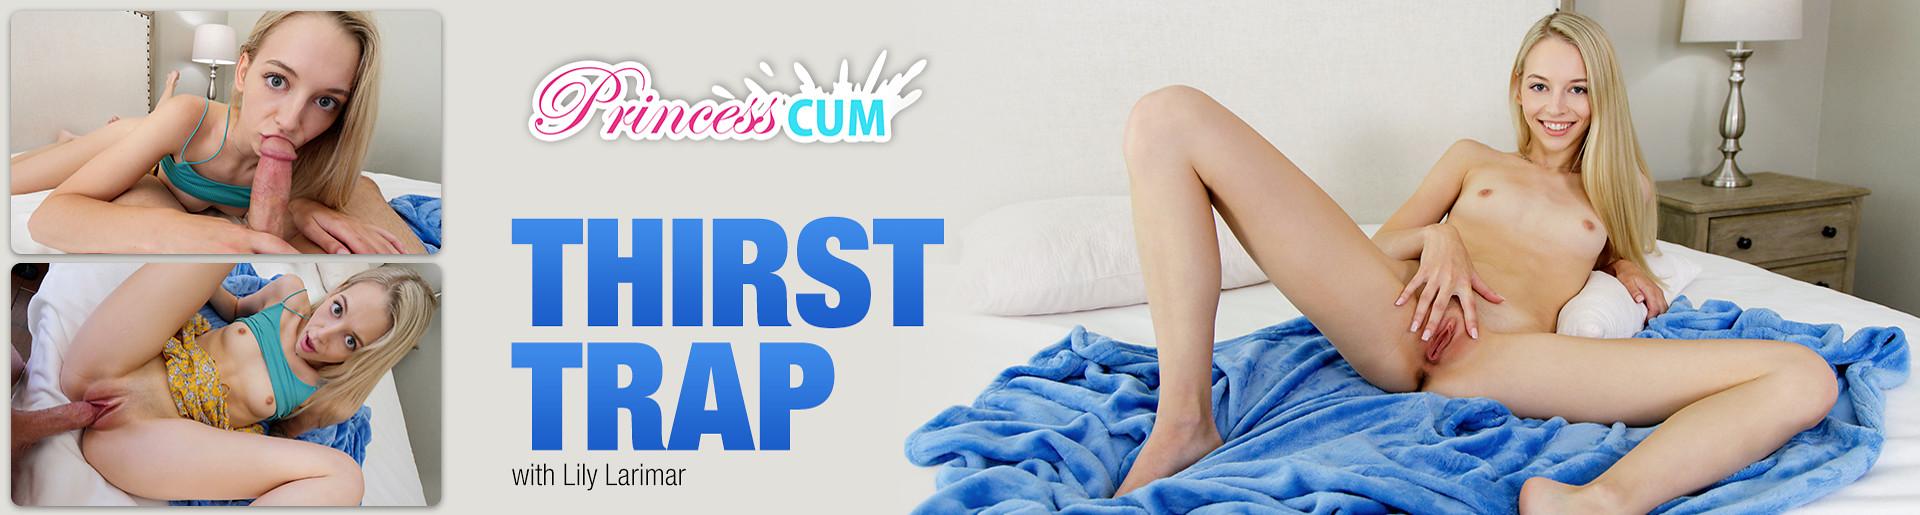 PrincessCum - Thirst Trap with Lily Larimar